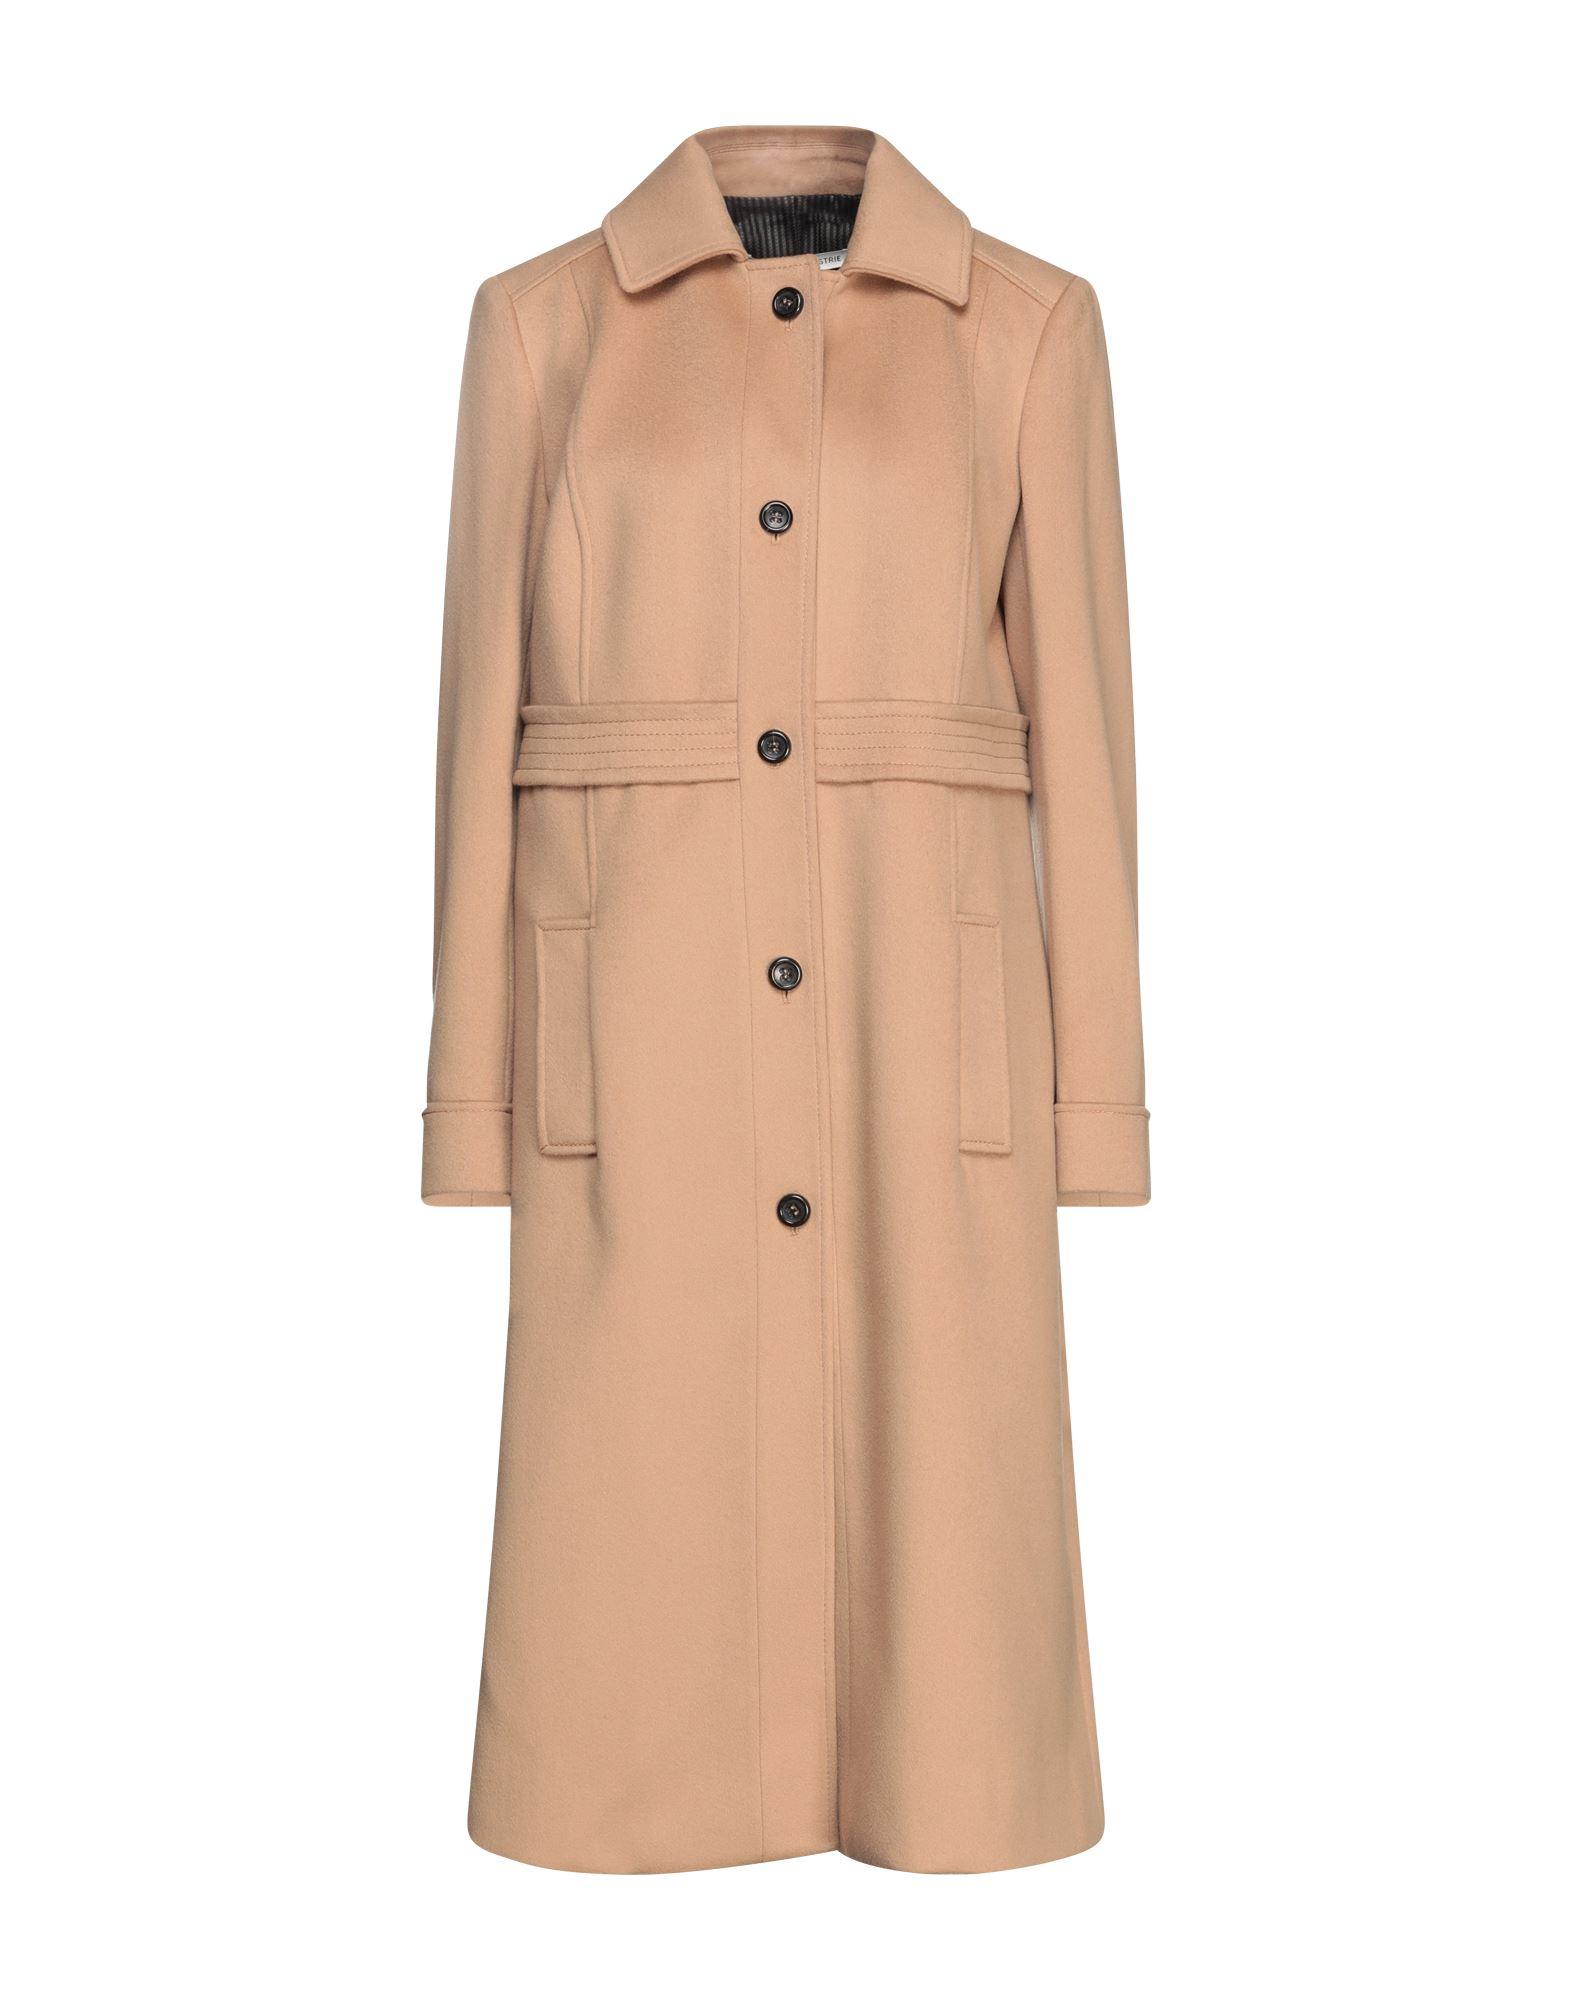 NEW YORK INDUSTRIE Coats - Item 41833553